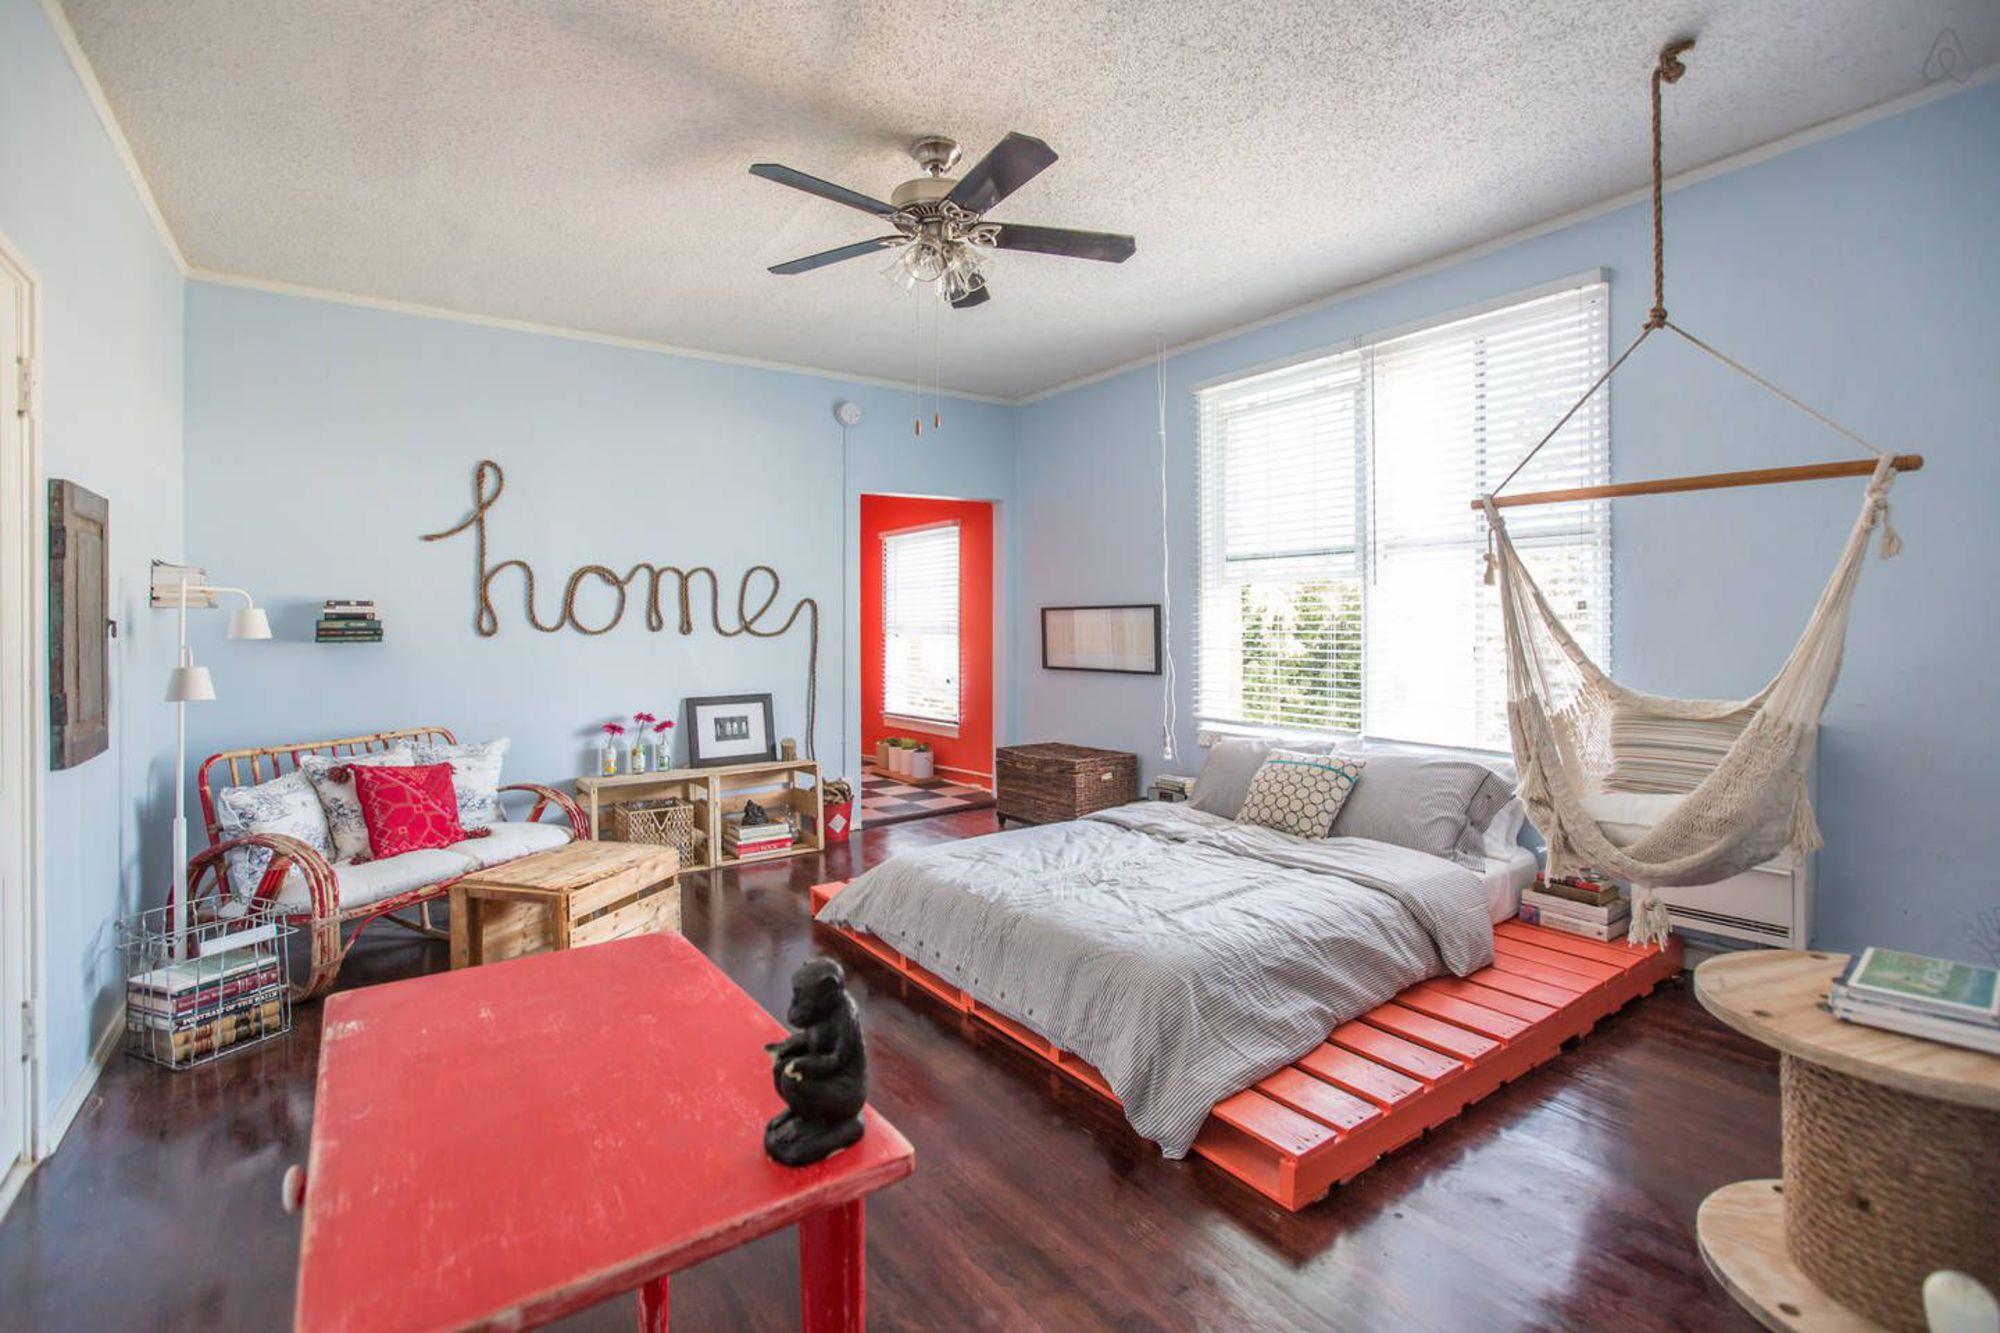 12 id es d co pour un studio d 39 tudiant des id es. Black Bedroom Furniture Sets. Home Design Ideas